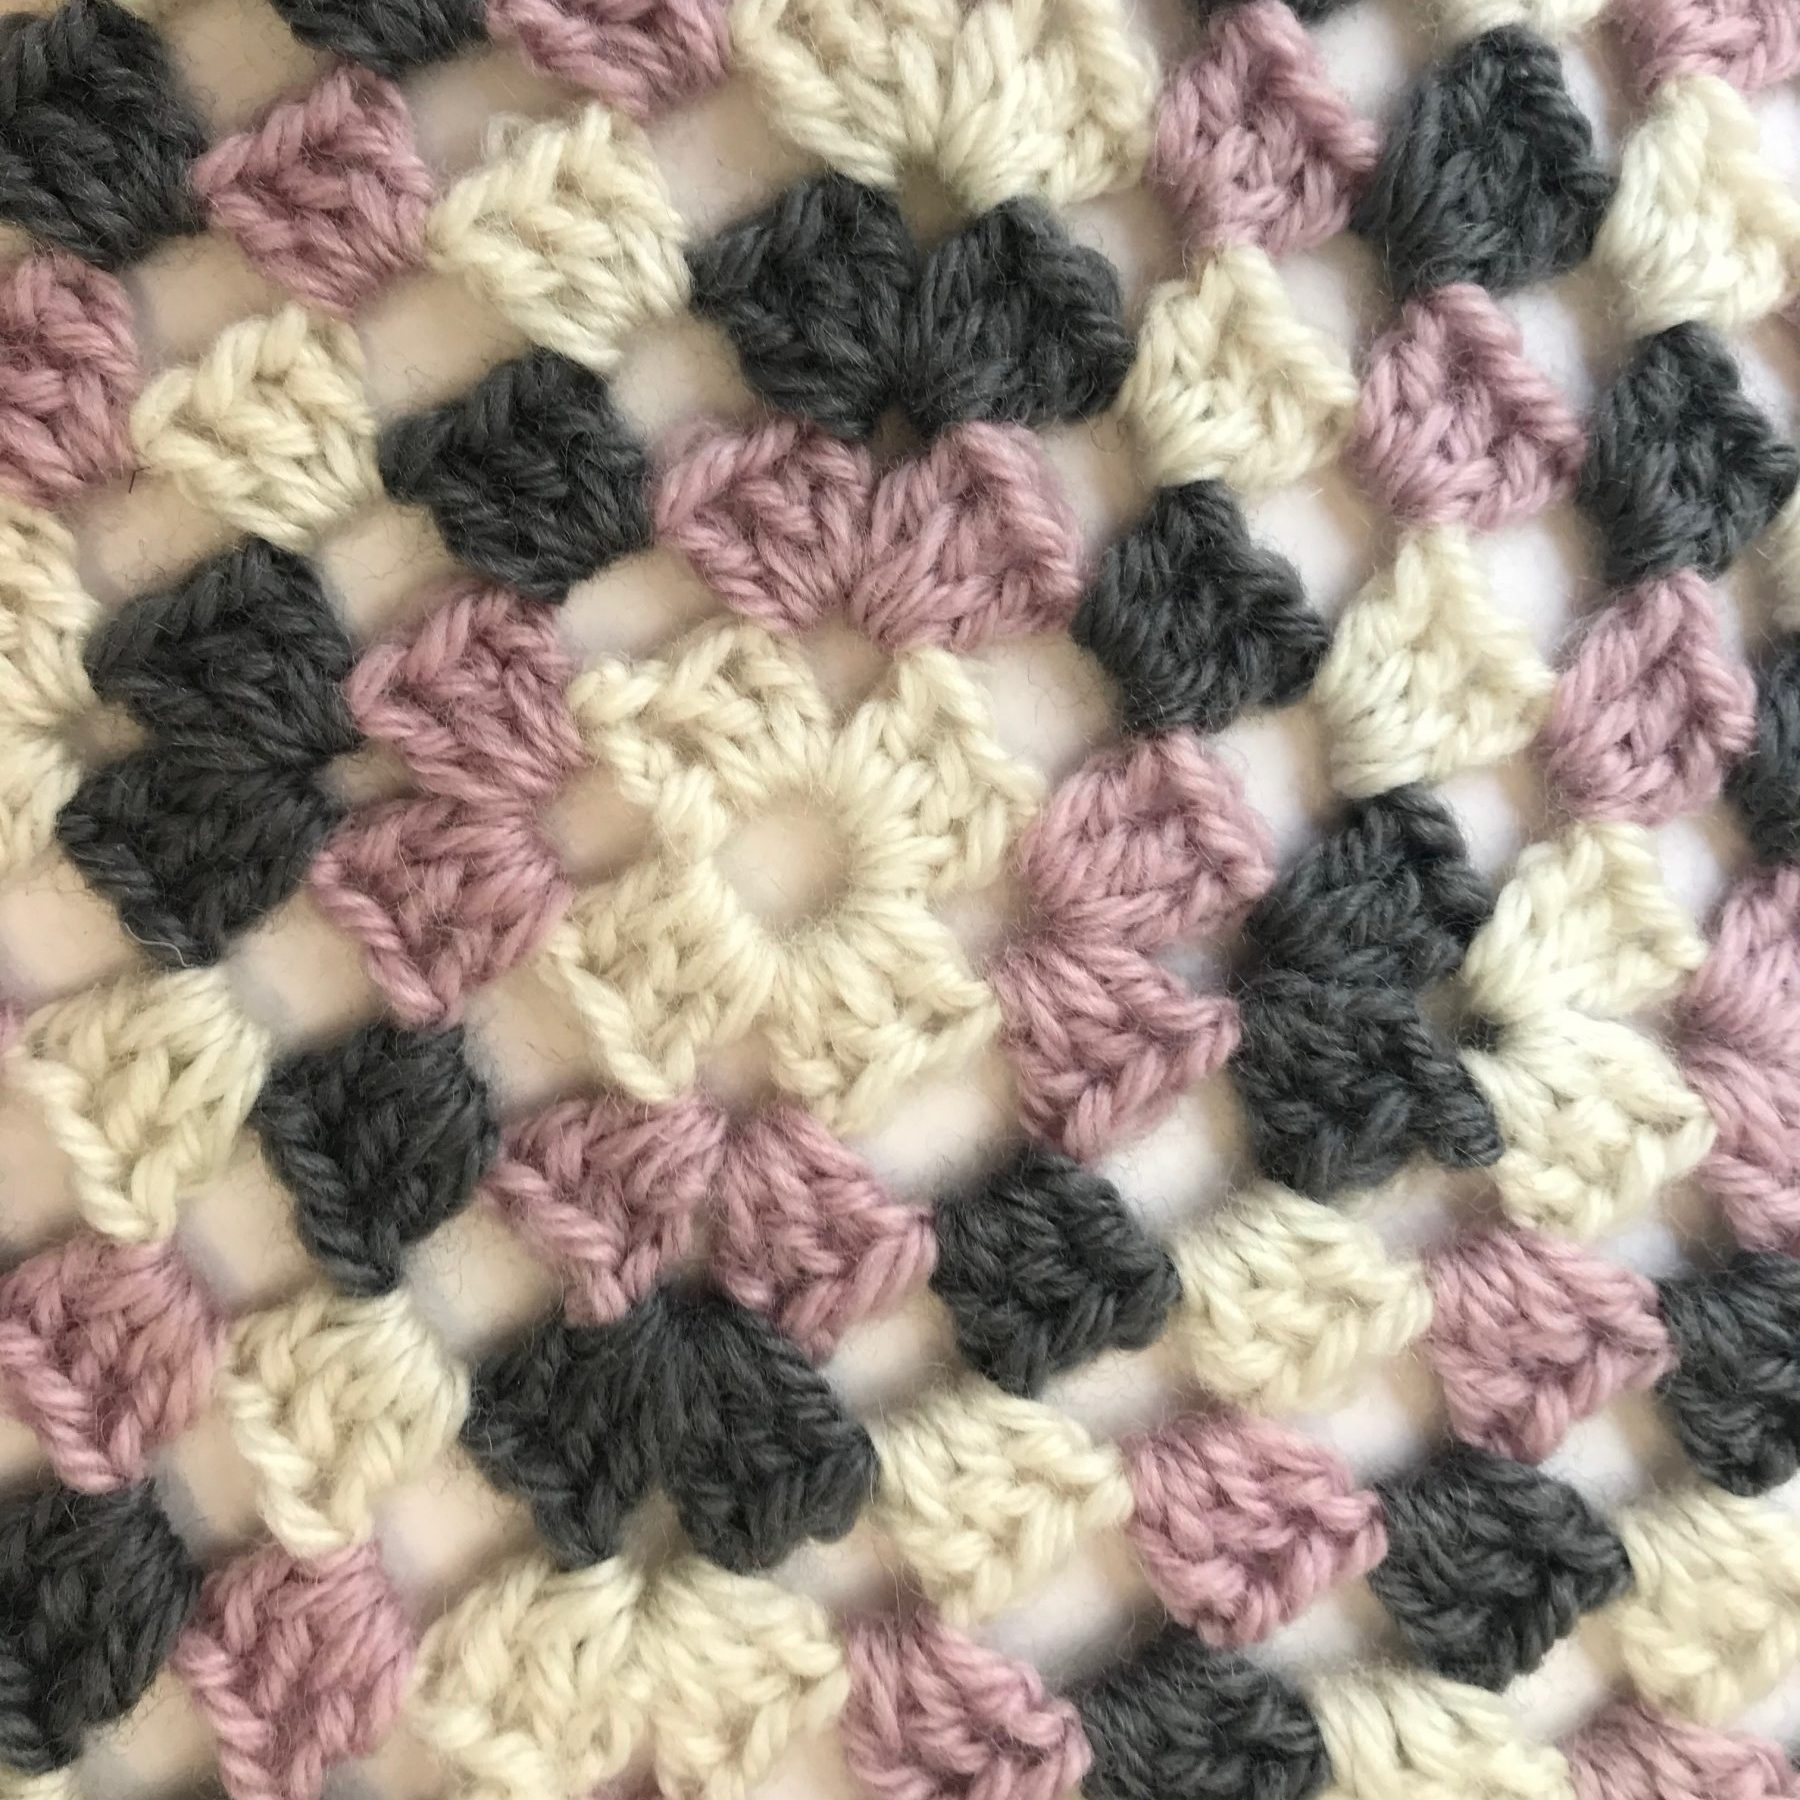 Example of crochet